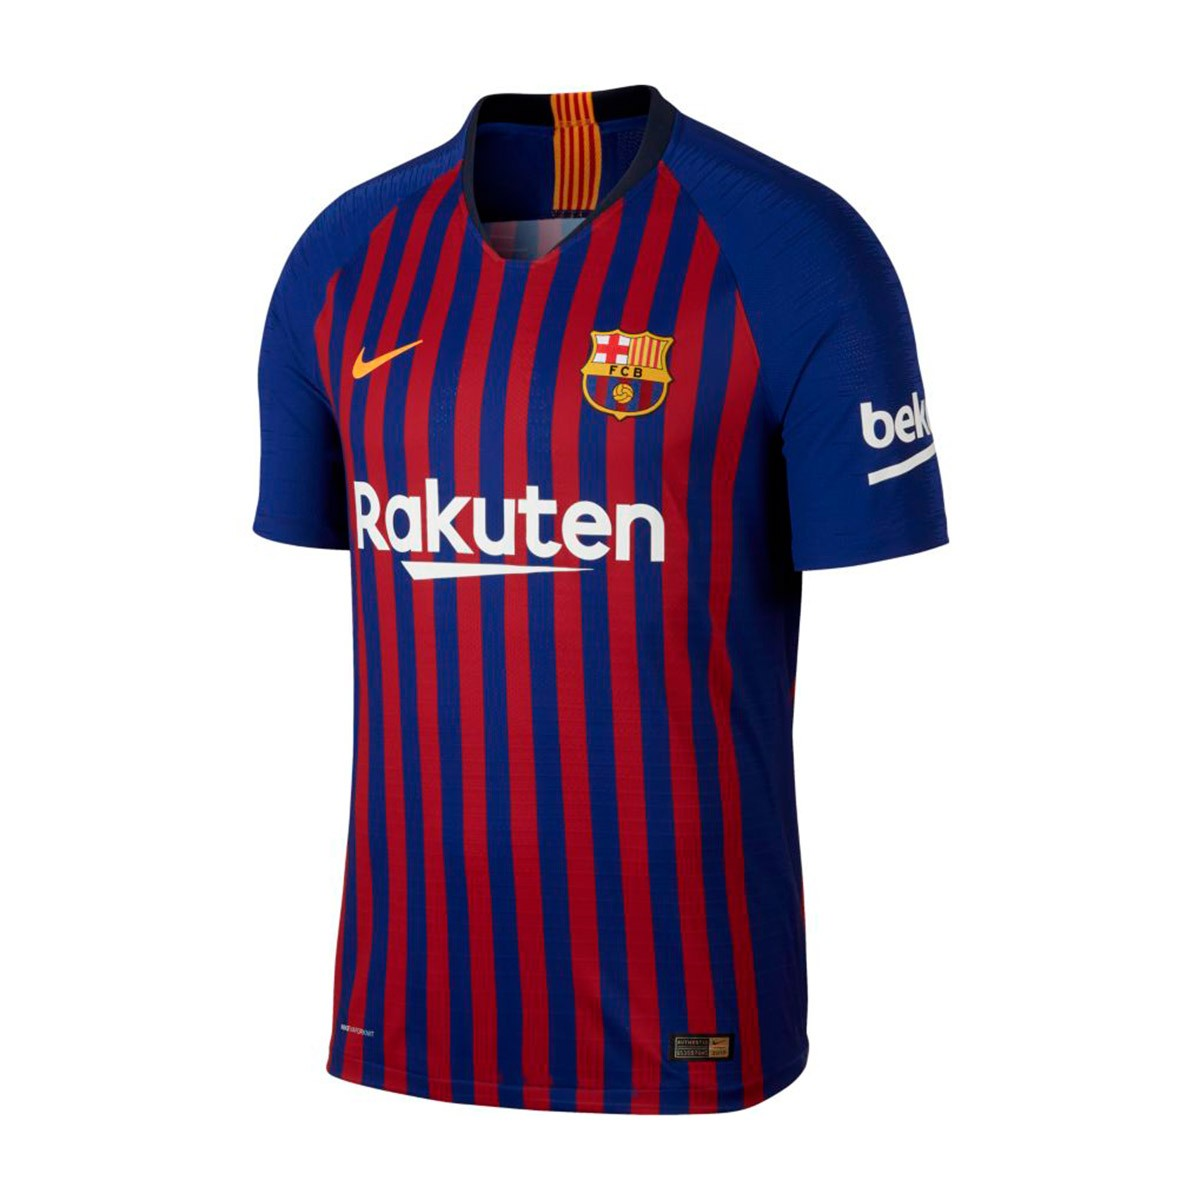 49db3ad92 Jersey Nike FC Barcelona Vapor 2018-2019 Home Deep royal blue-University  gold - Tienda de fútbol Fútbol Emotion